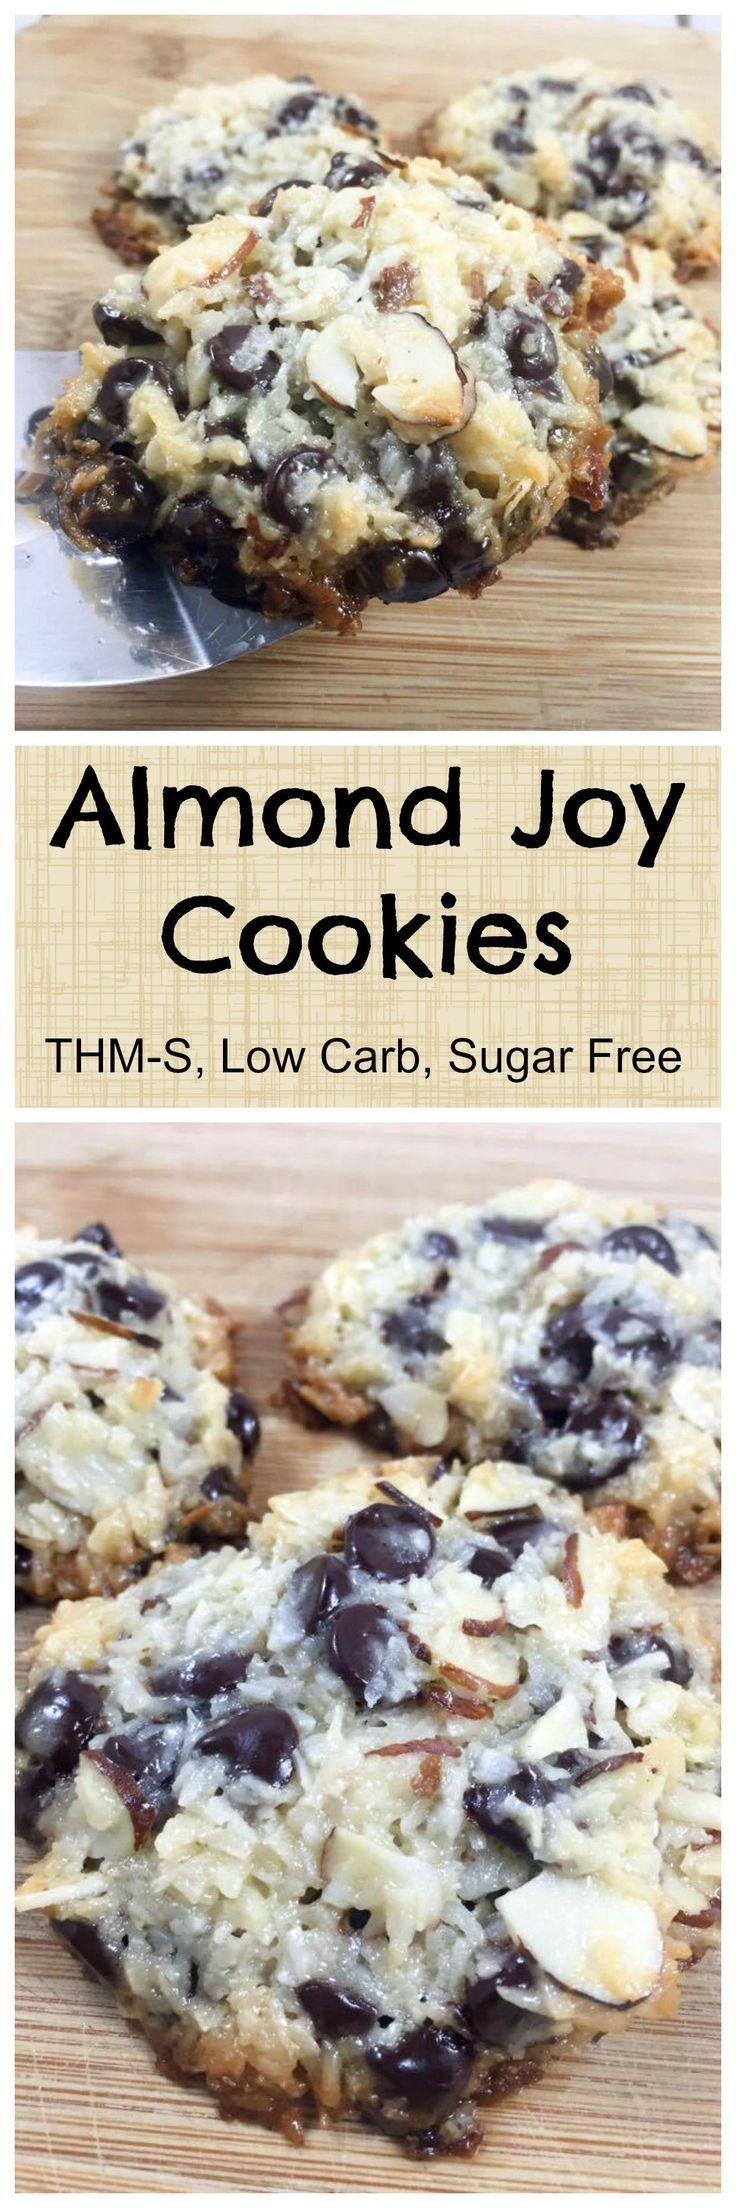 Low Carb, Sugar Free Almond Joy Cookies   THM Christmas cookies ...